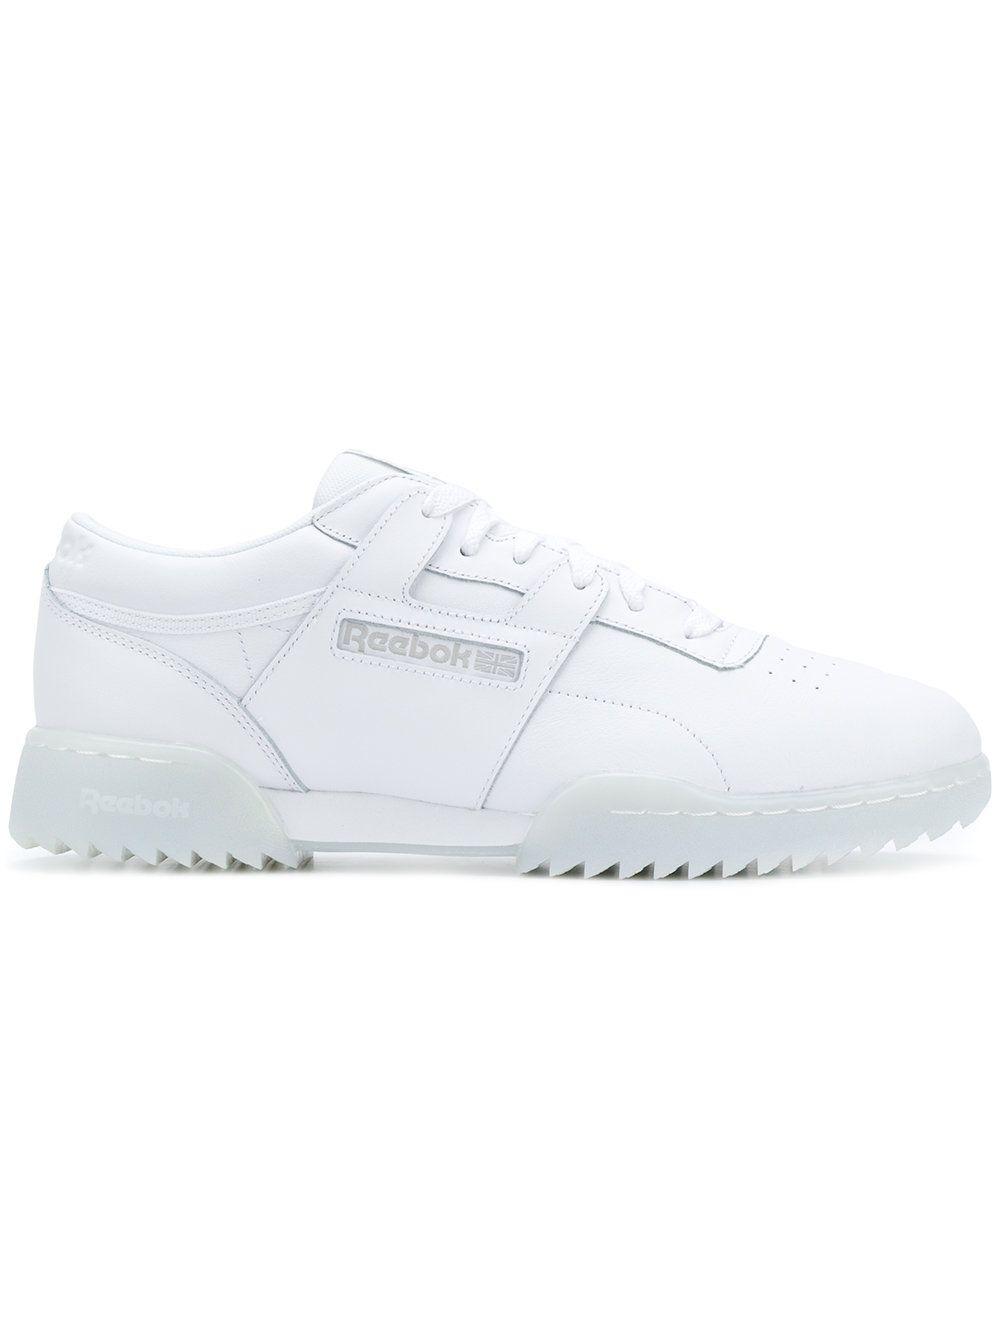 59cc407d2fe Reebok Workout Clean Ripple sneakers